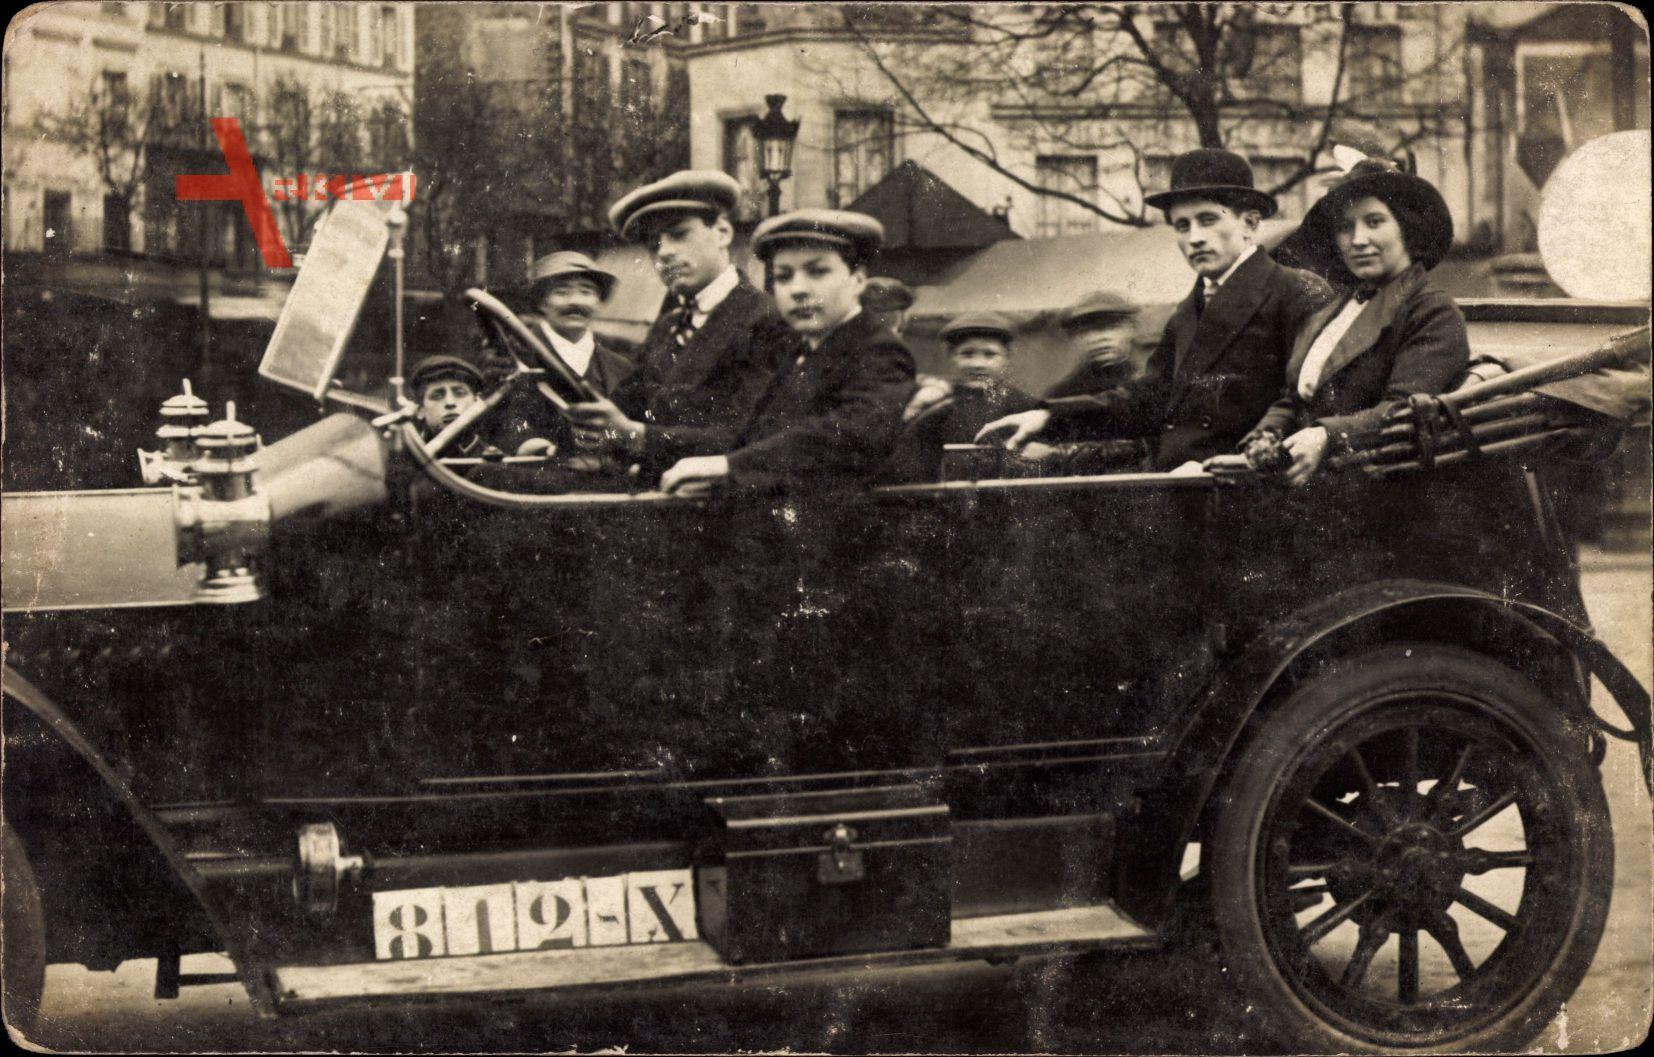 Frankreich, Automobil, Junger Fahrer, Straßenszene, 812 X